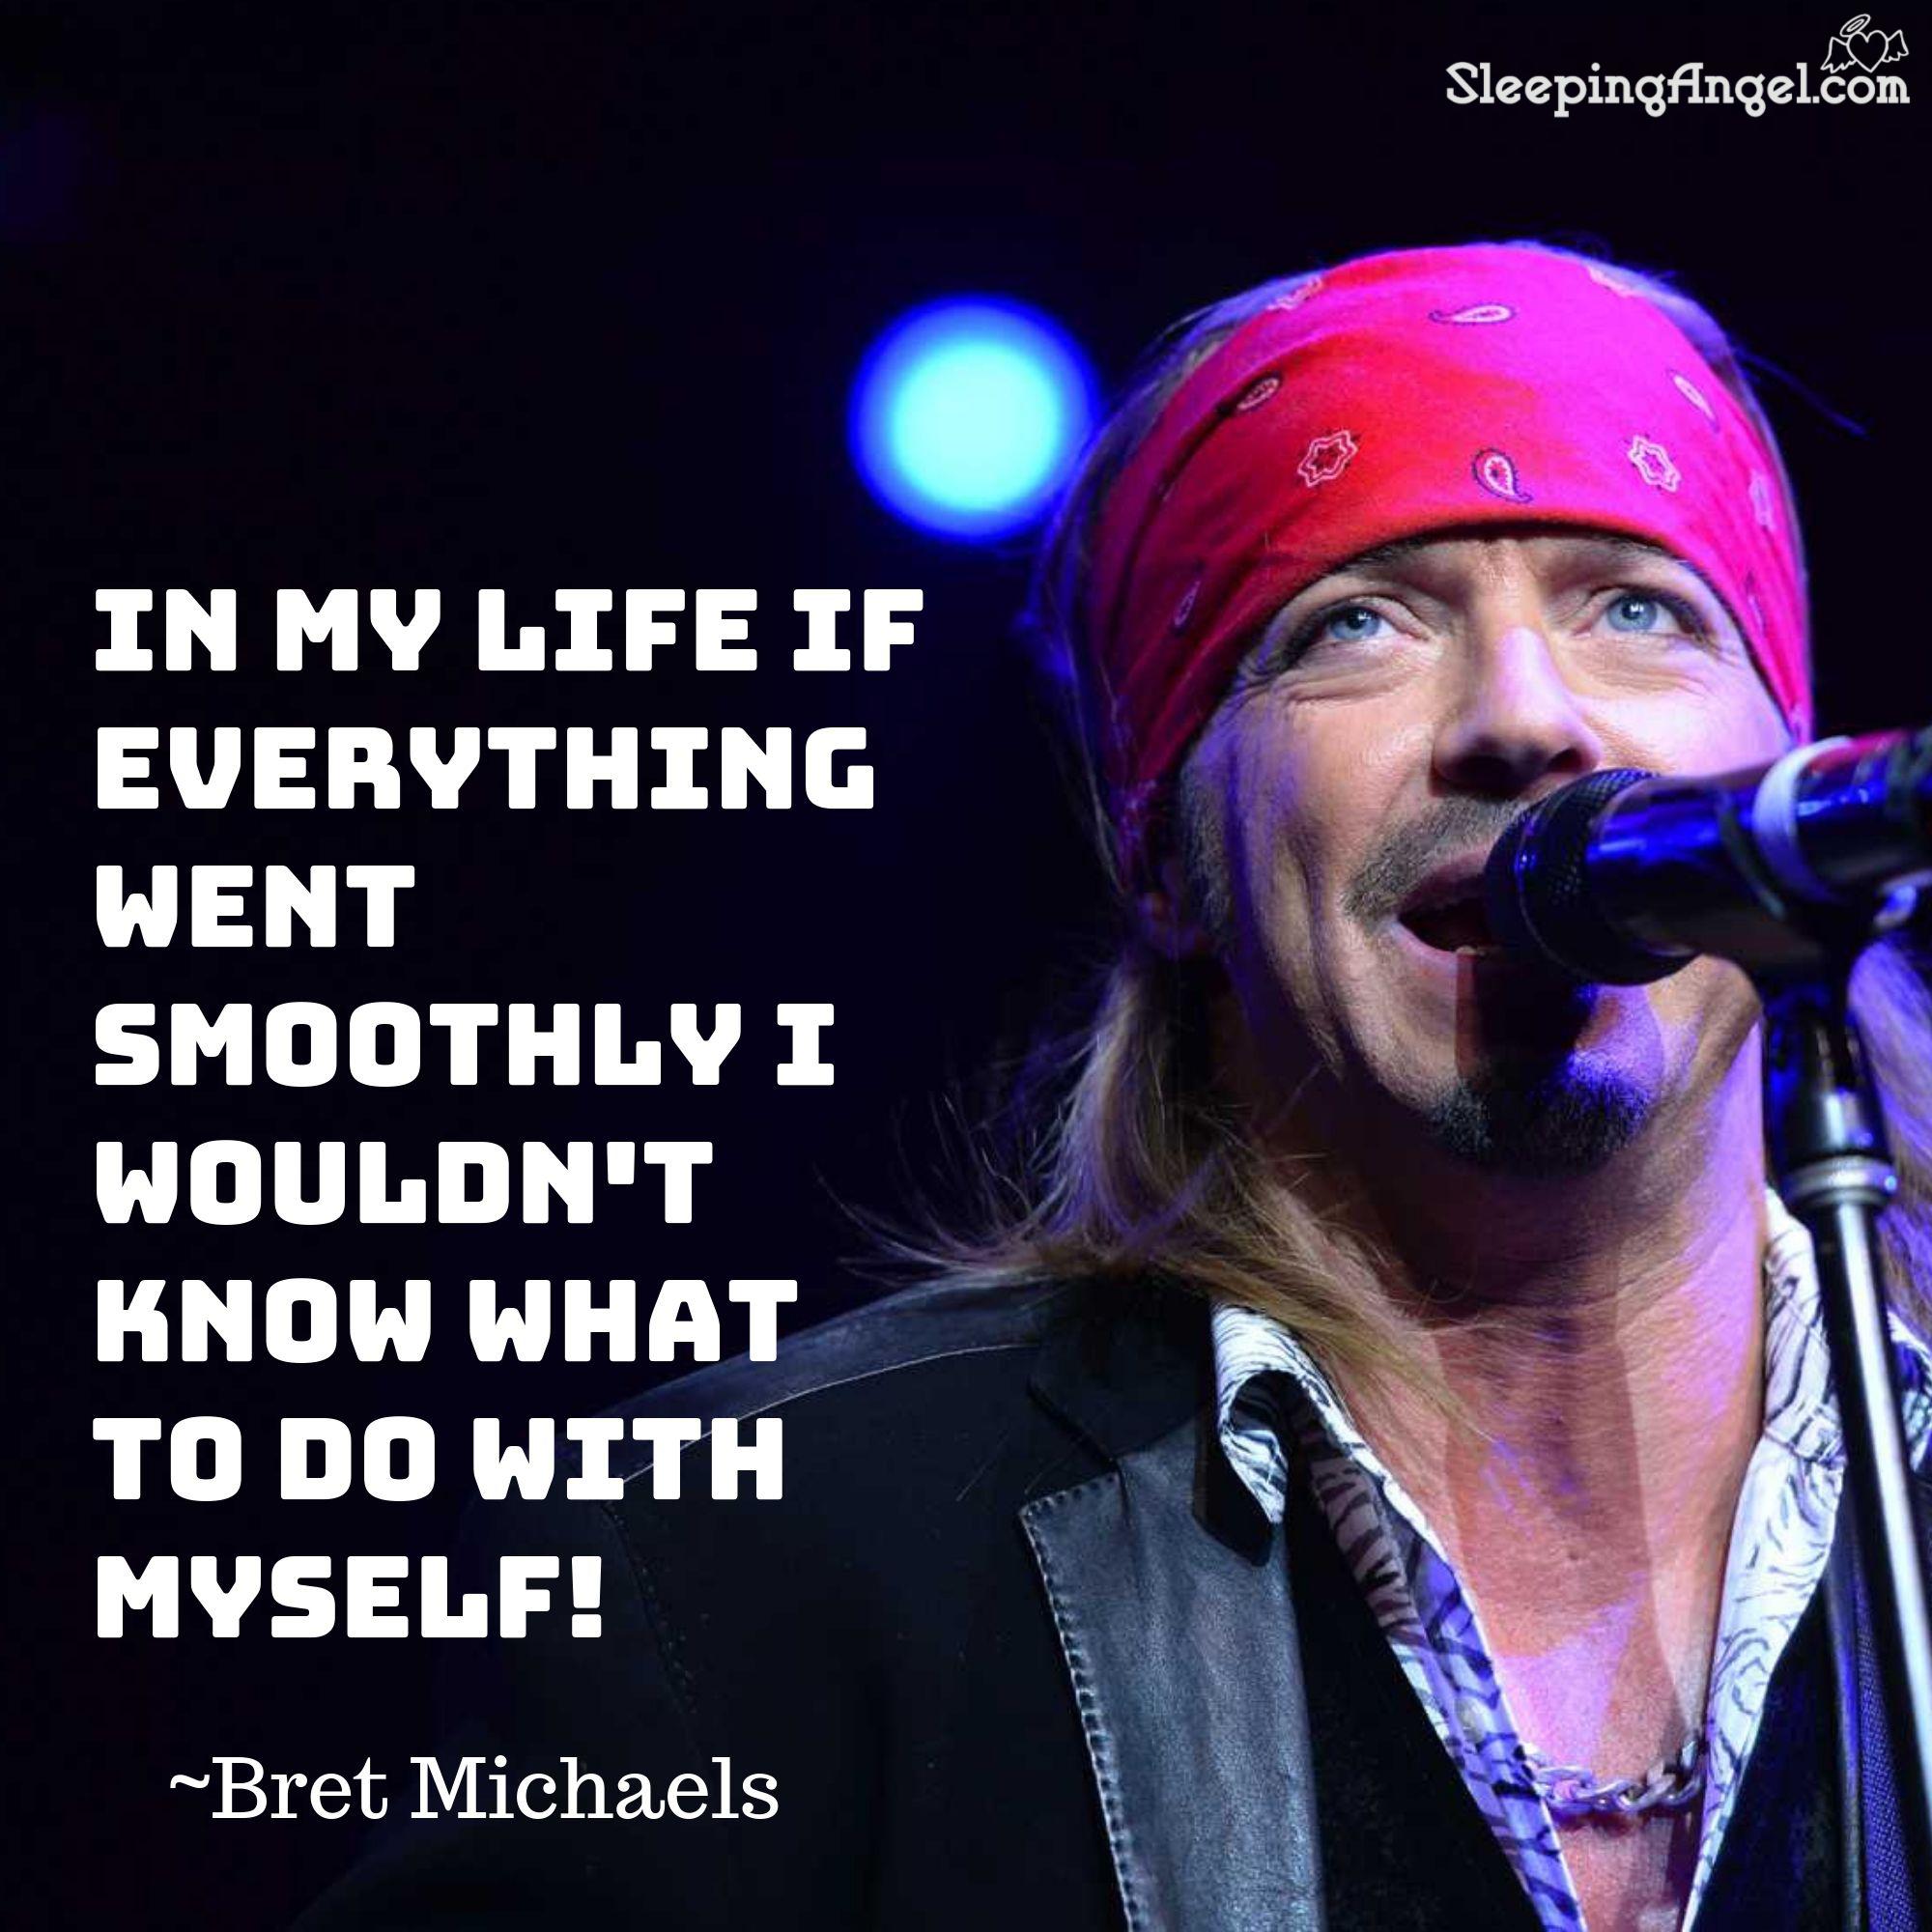 Bret Michaels Quote